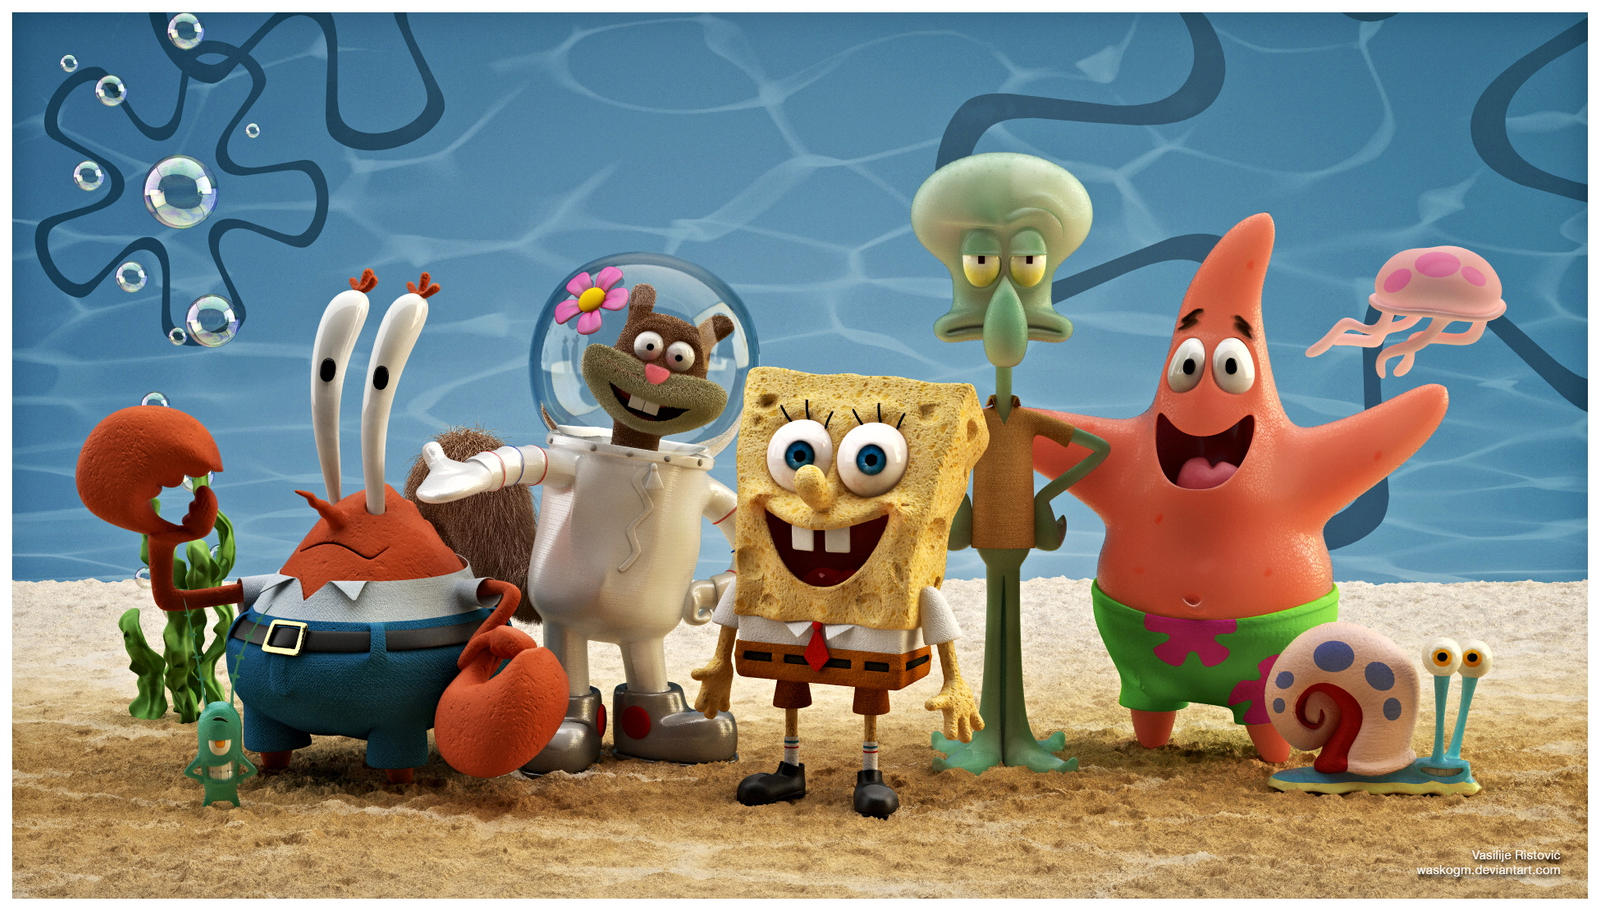 spongebob squarepants characters 3dwaskogm on deviantart